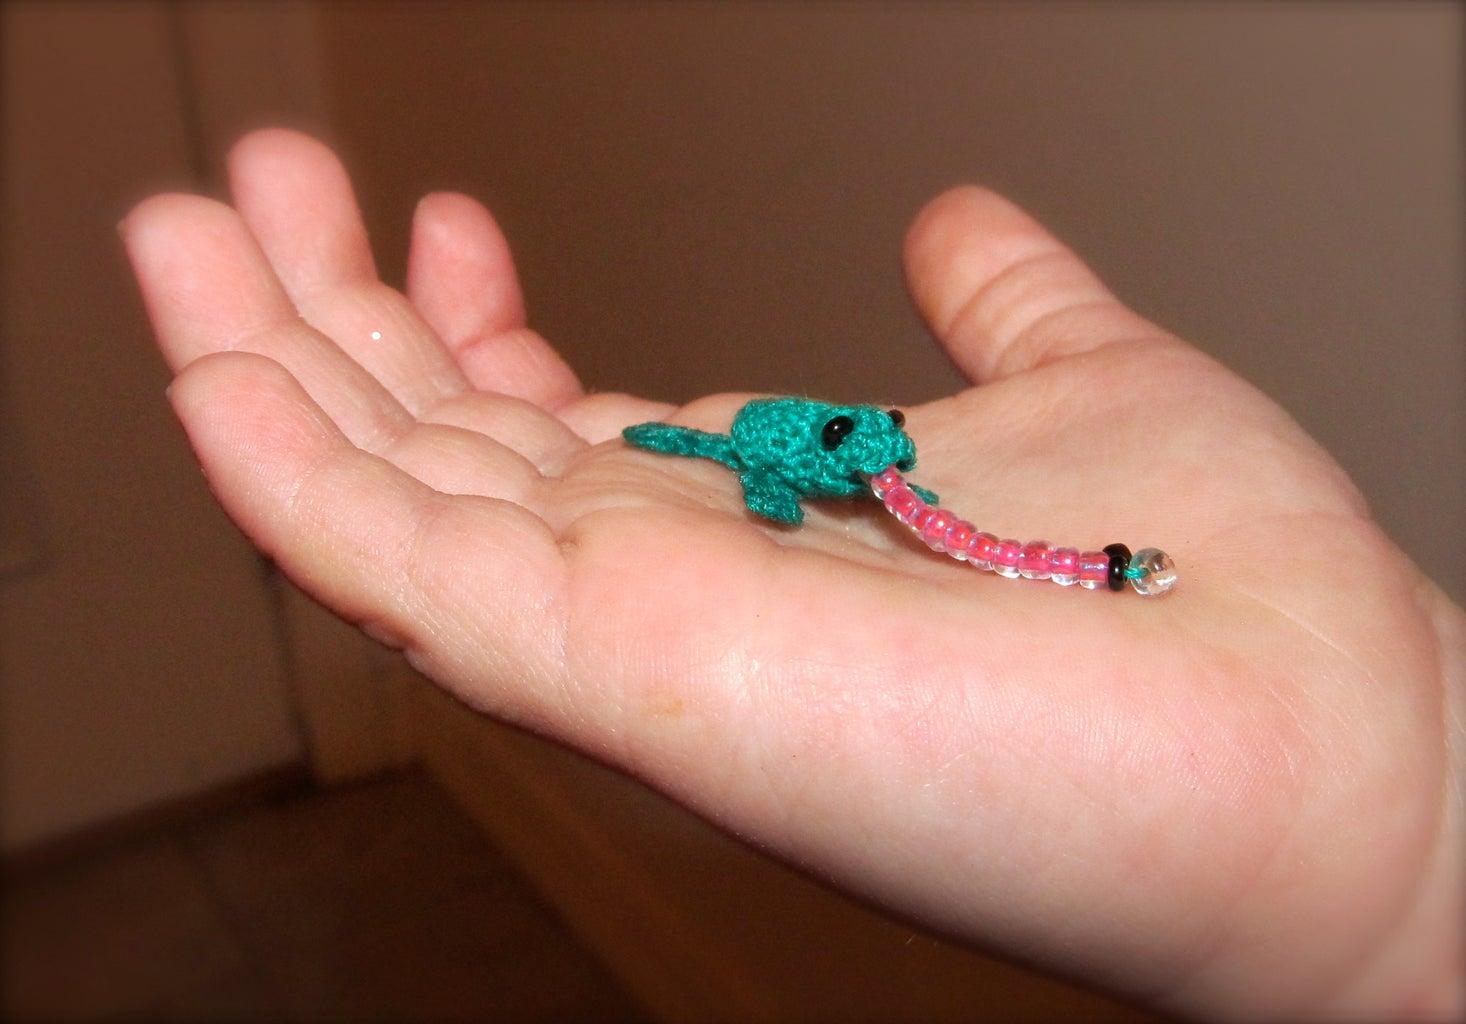 EXTREME CROCHET (Frog Earrings)